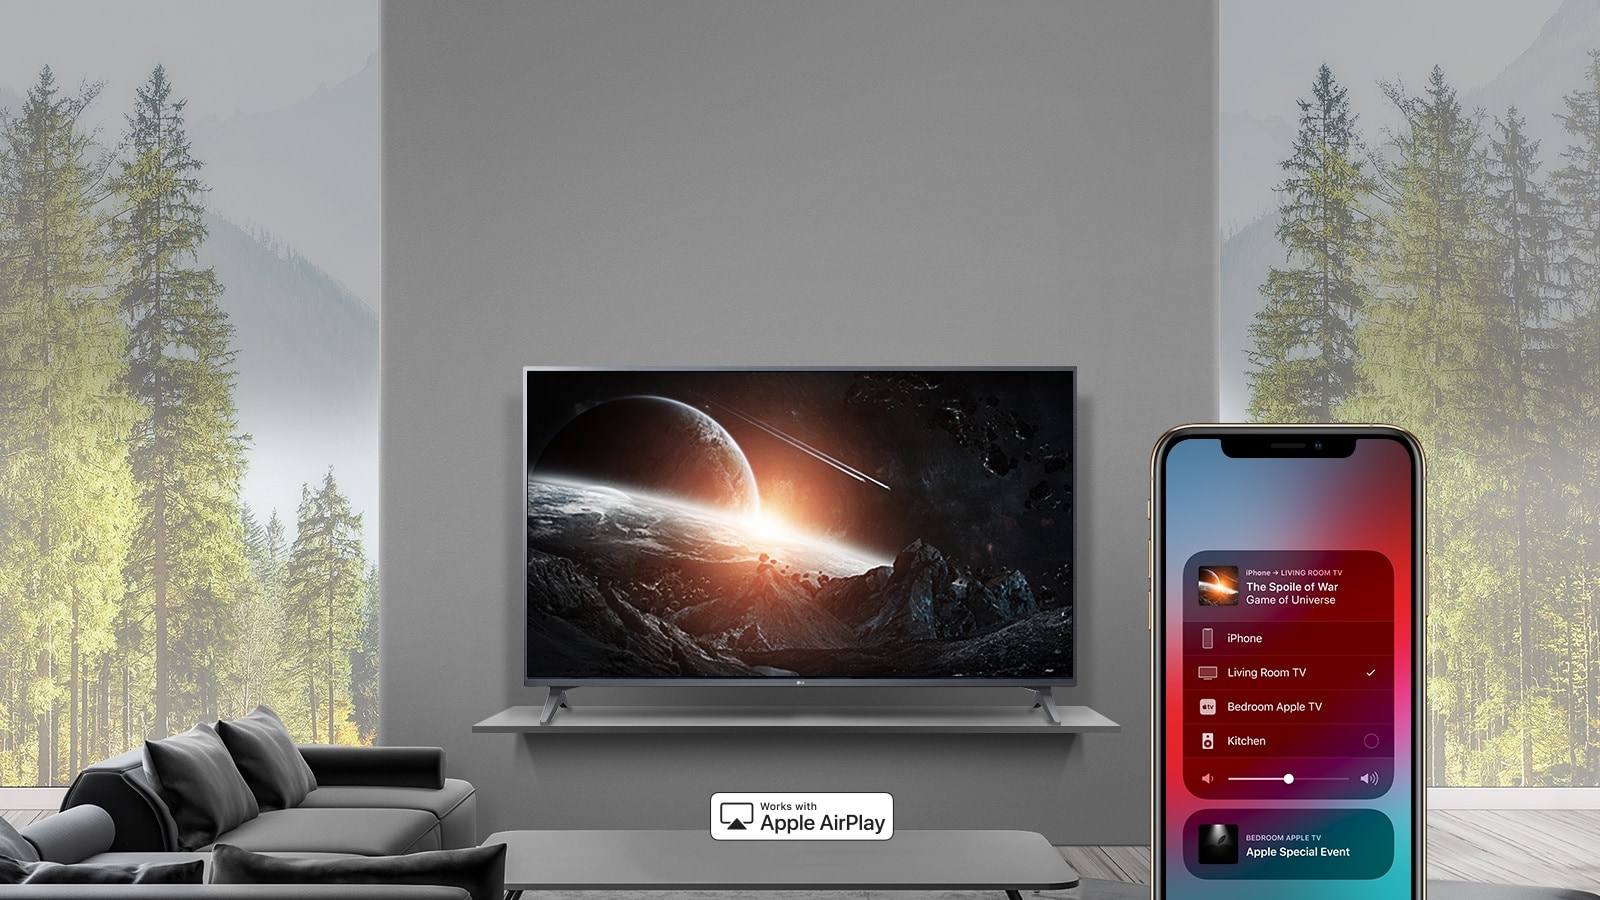 LG 55 inch Class 4K Smart UHD TV w/ AI ThinQ® (54 6'' Diag)